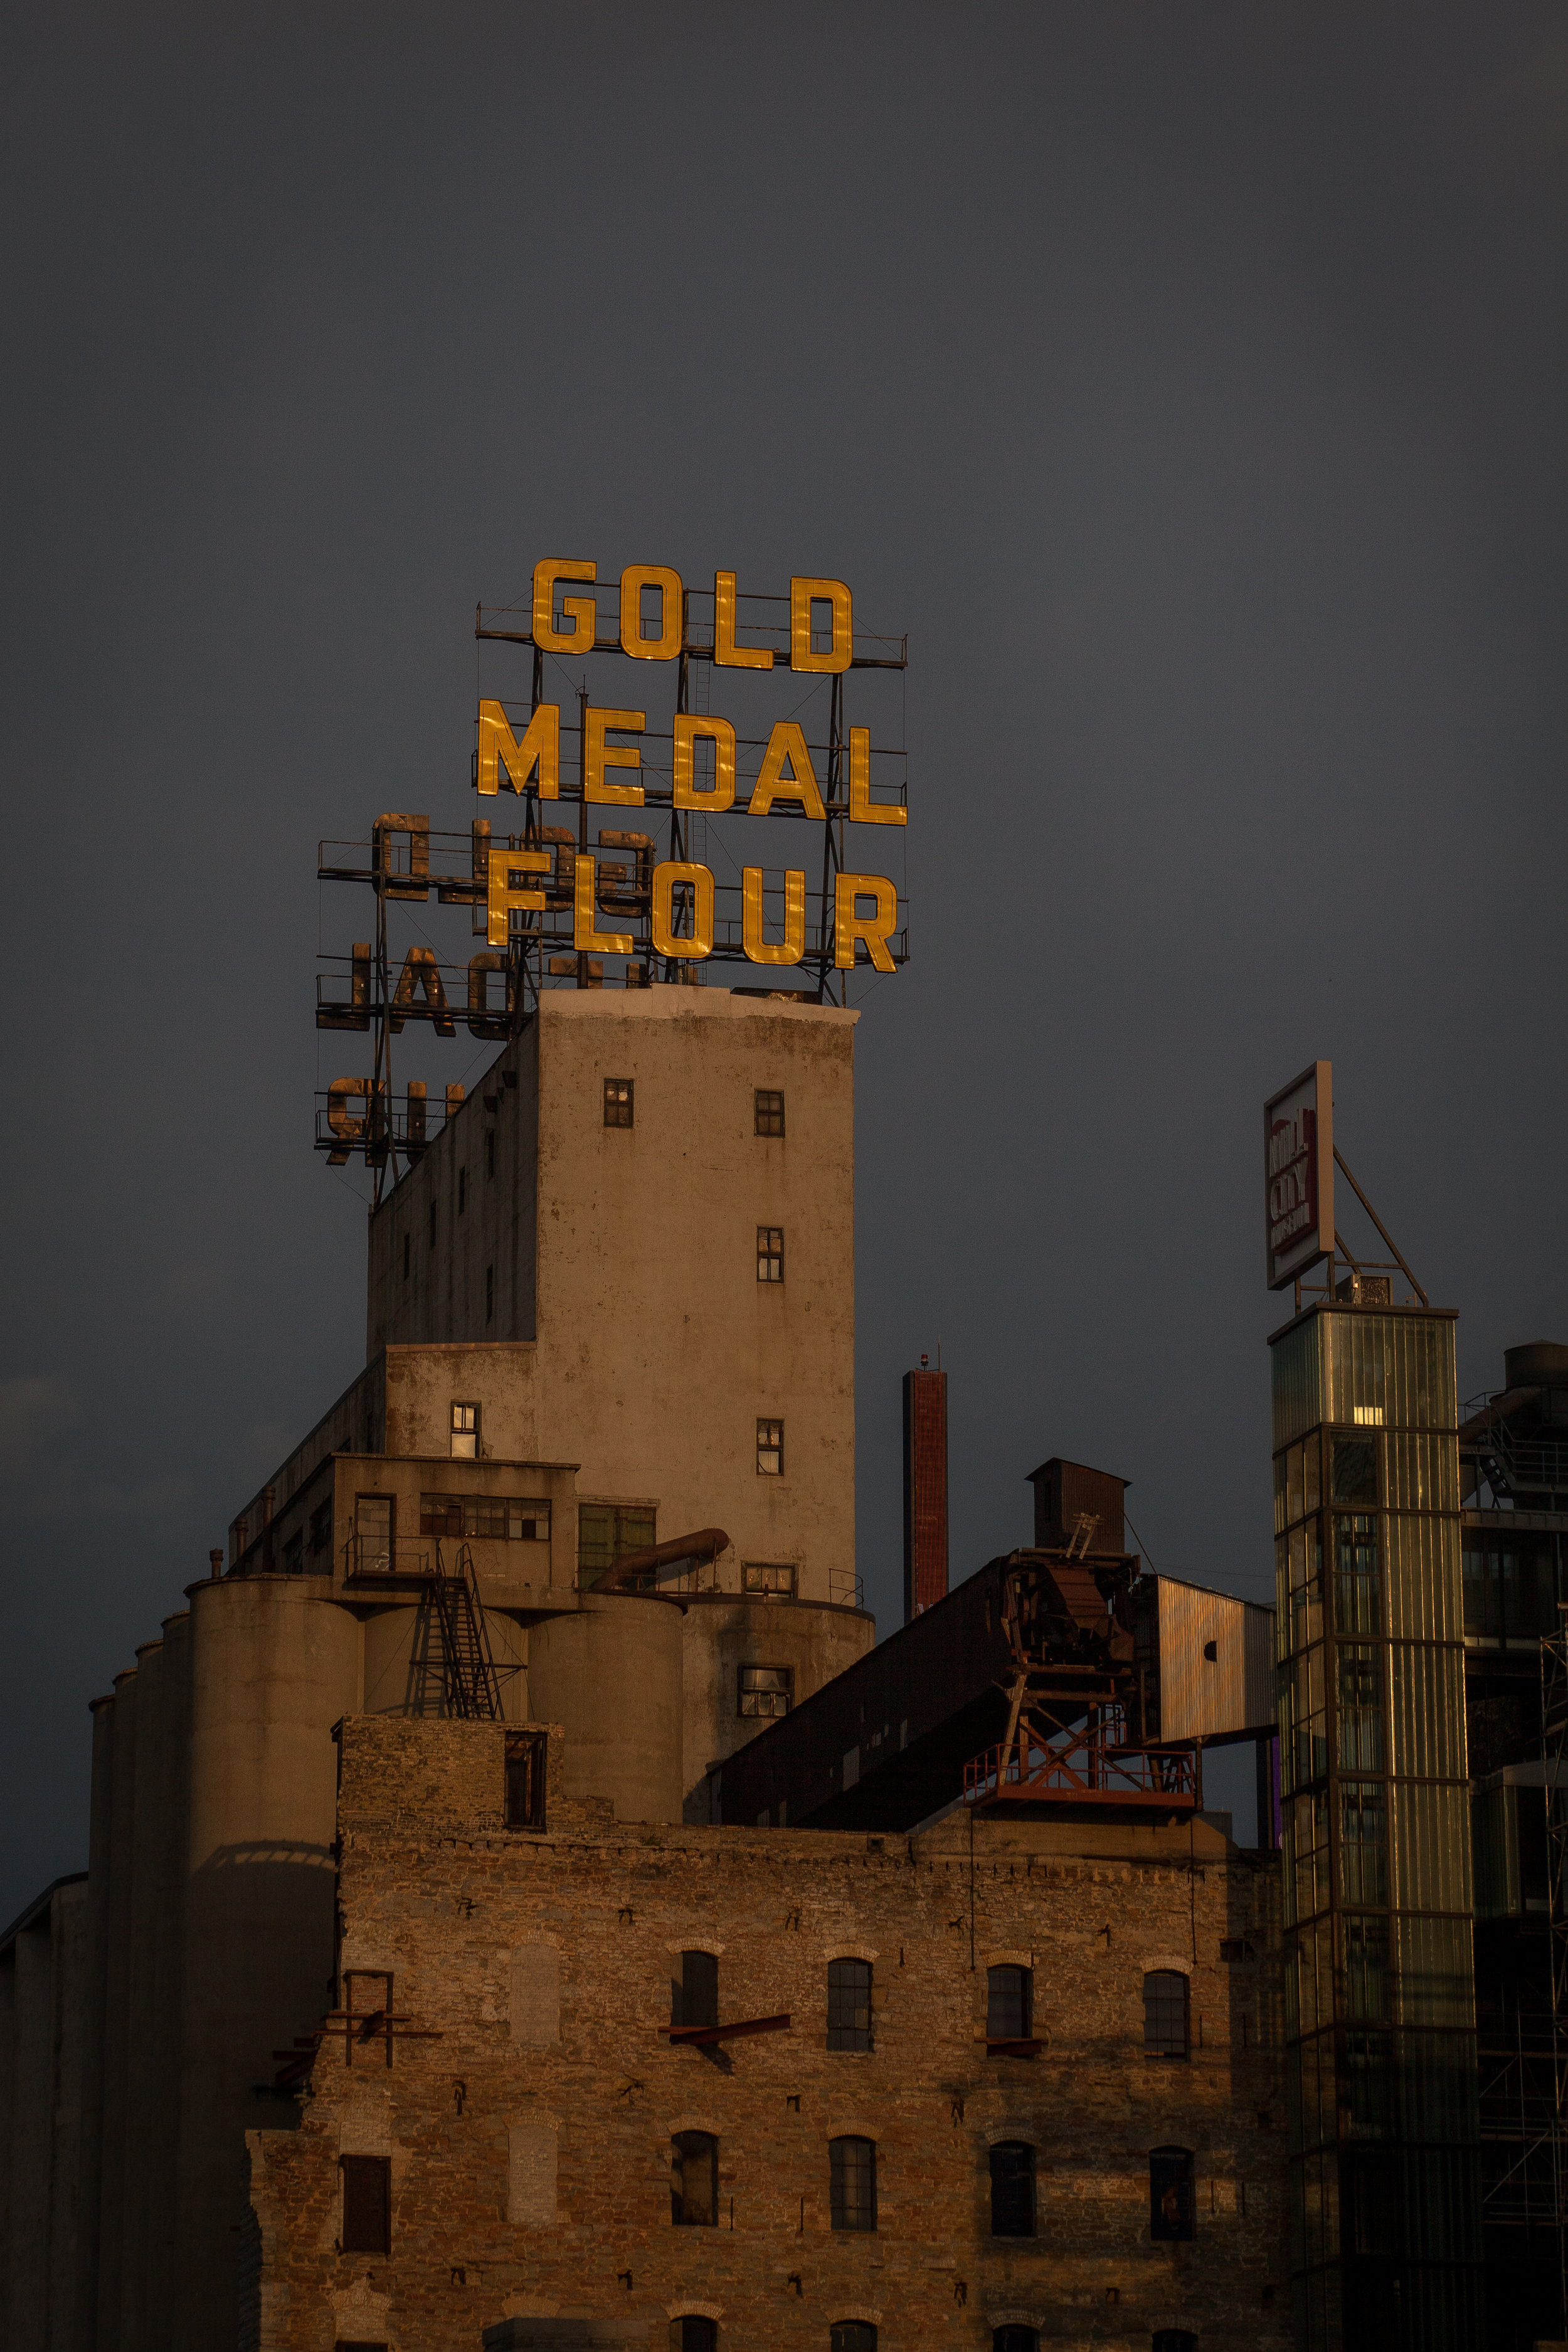 Gold Metal Flour (1 of 1).jpg